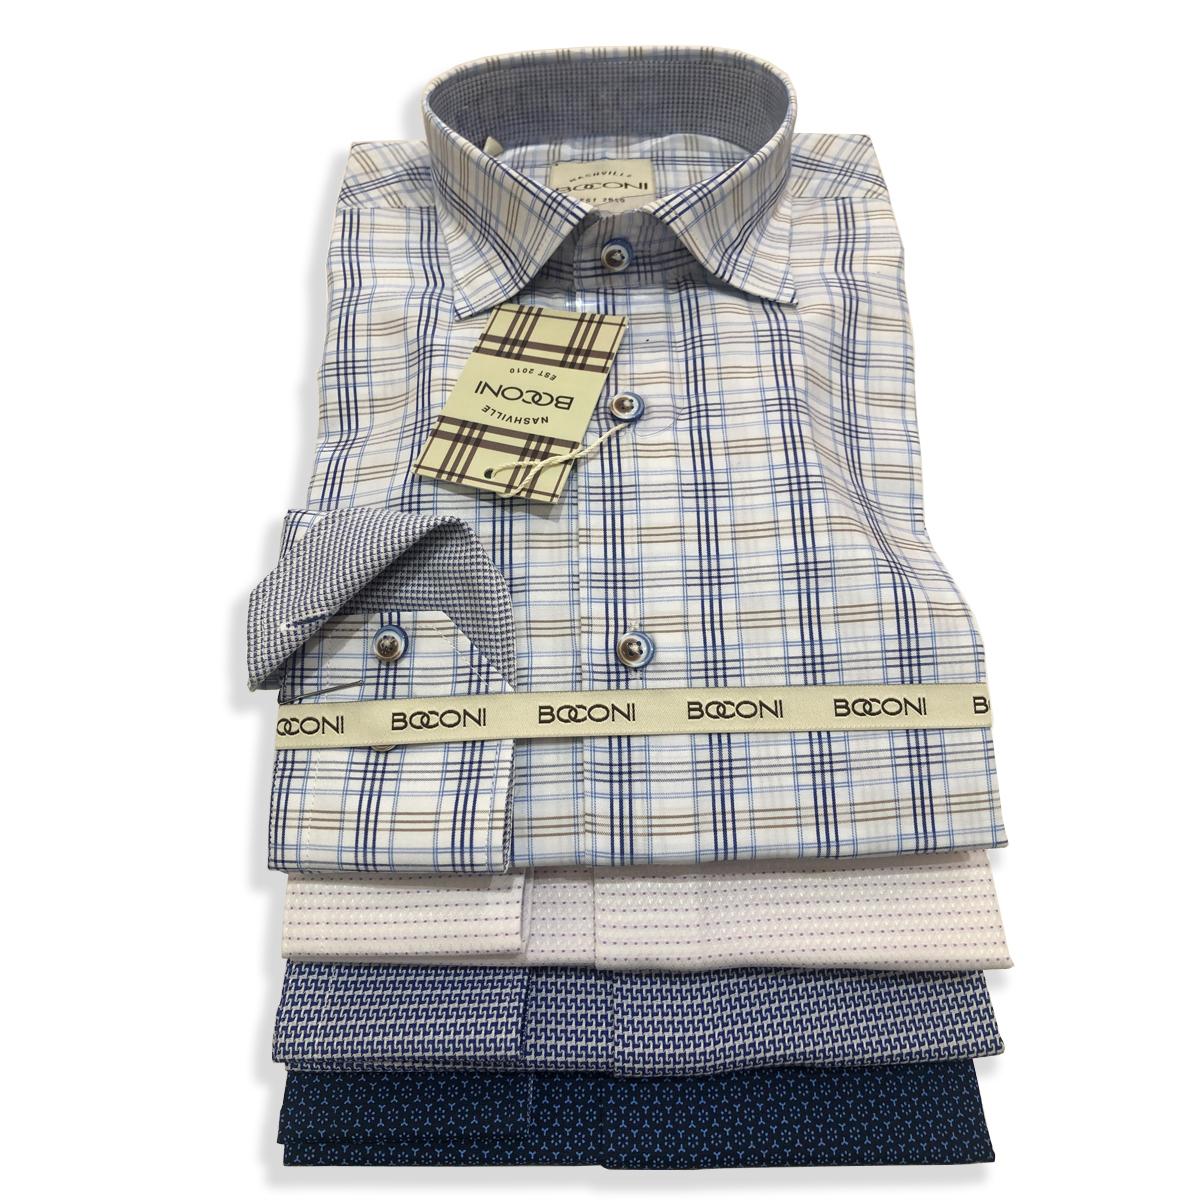 shirts square.jpg